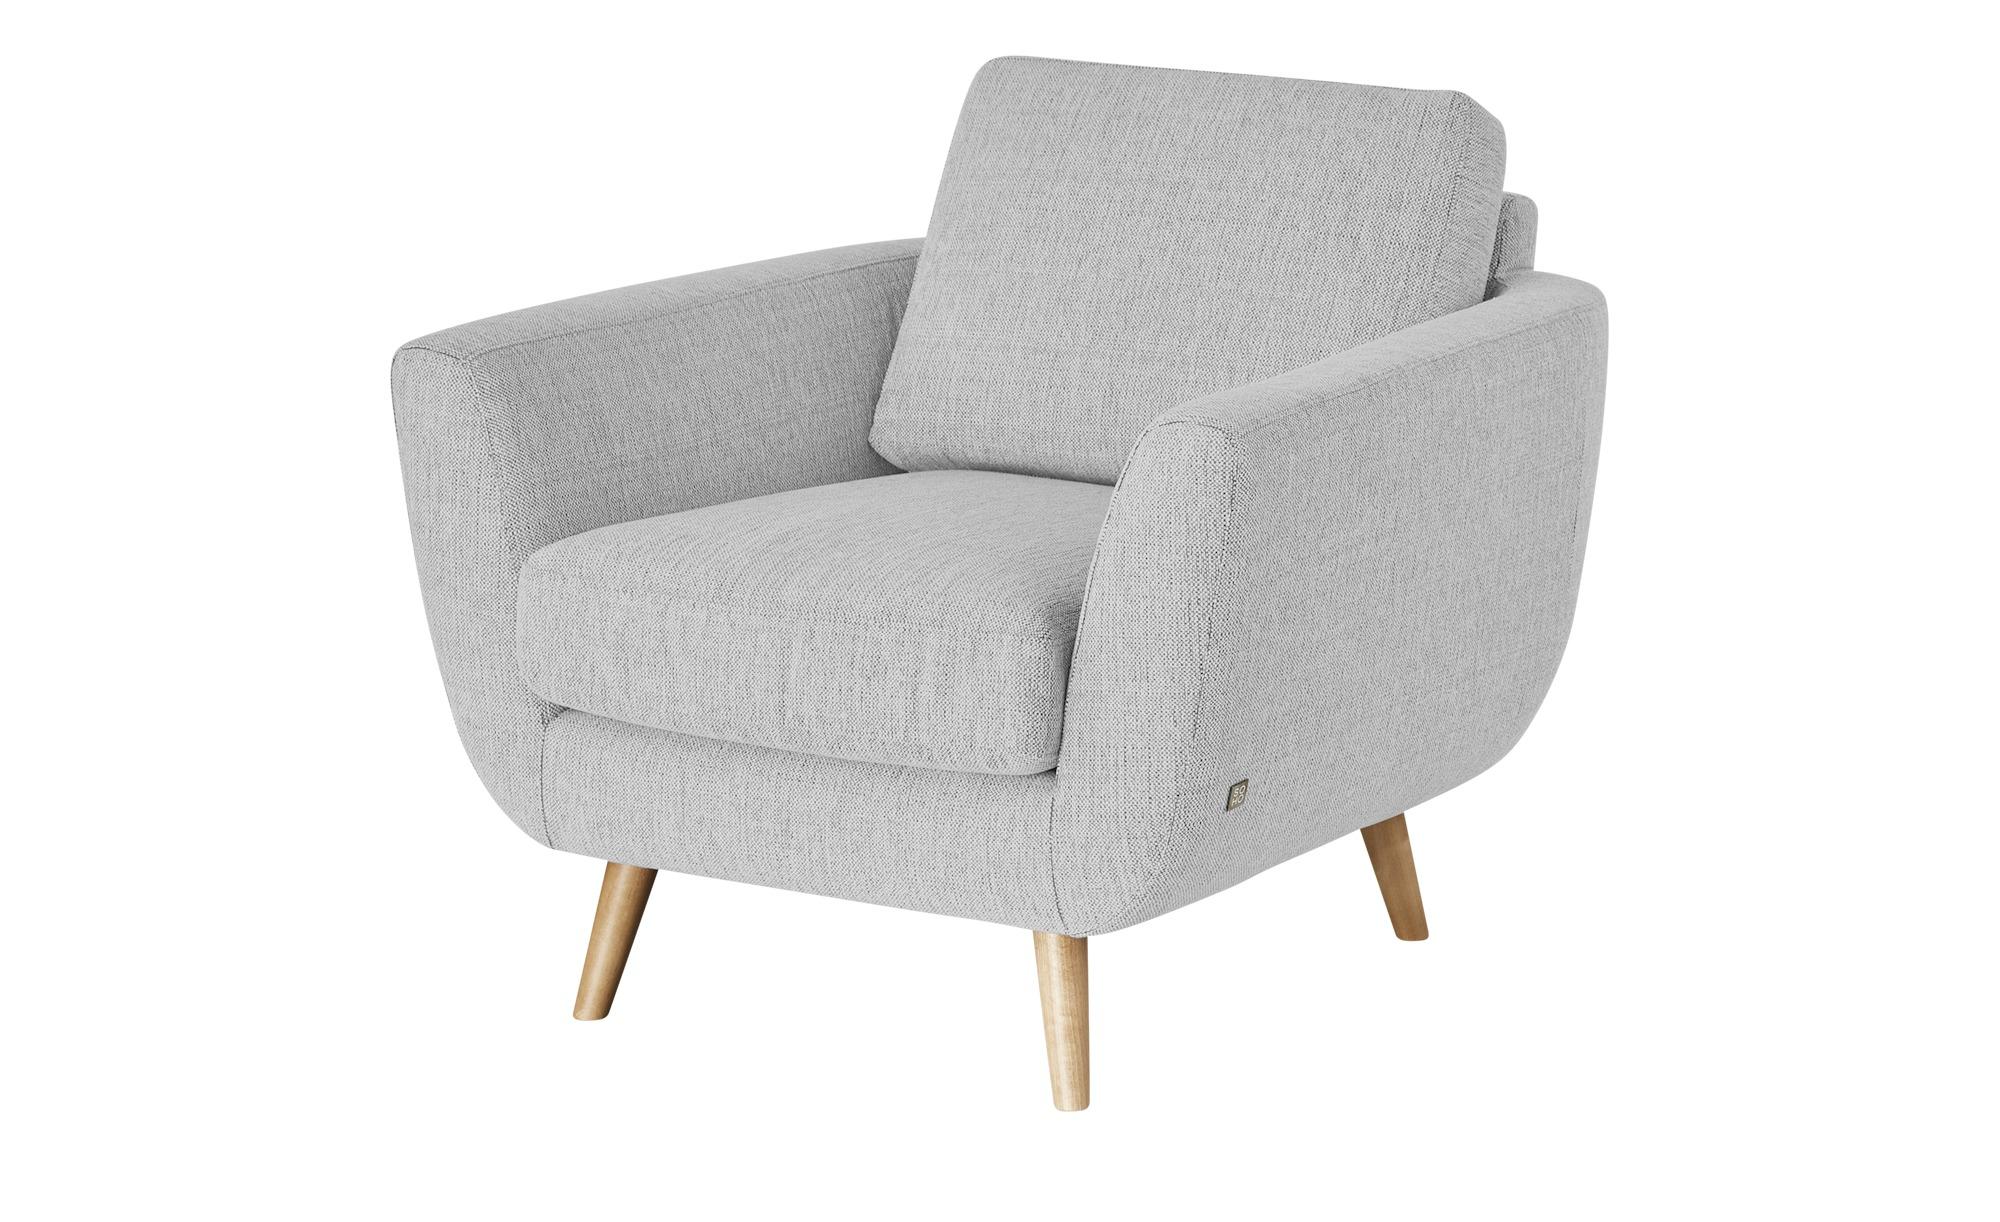 SOHO Sessel grau - Stoff Smilla ¦ grau ¦ Maße (cm): B: 94 H: 85 T: 93 Polstermöbel > Sessel > Ohrensessel - Höffner